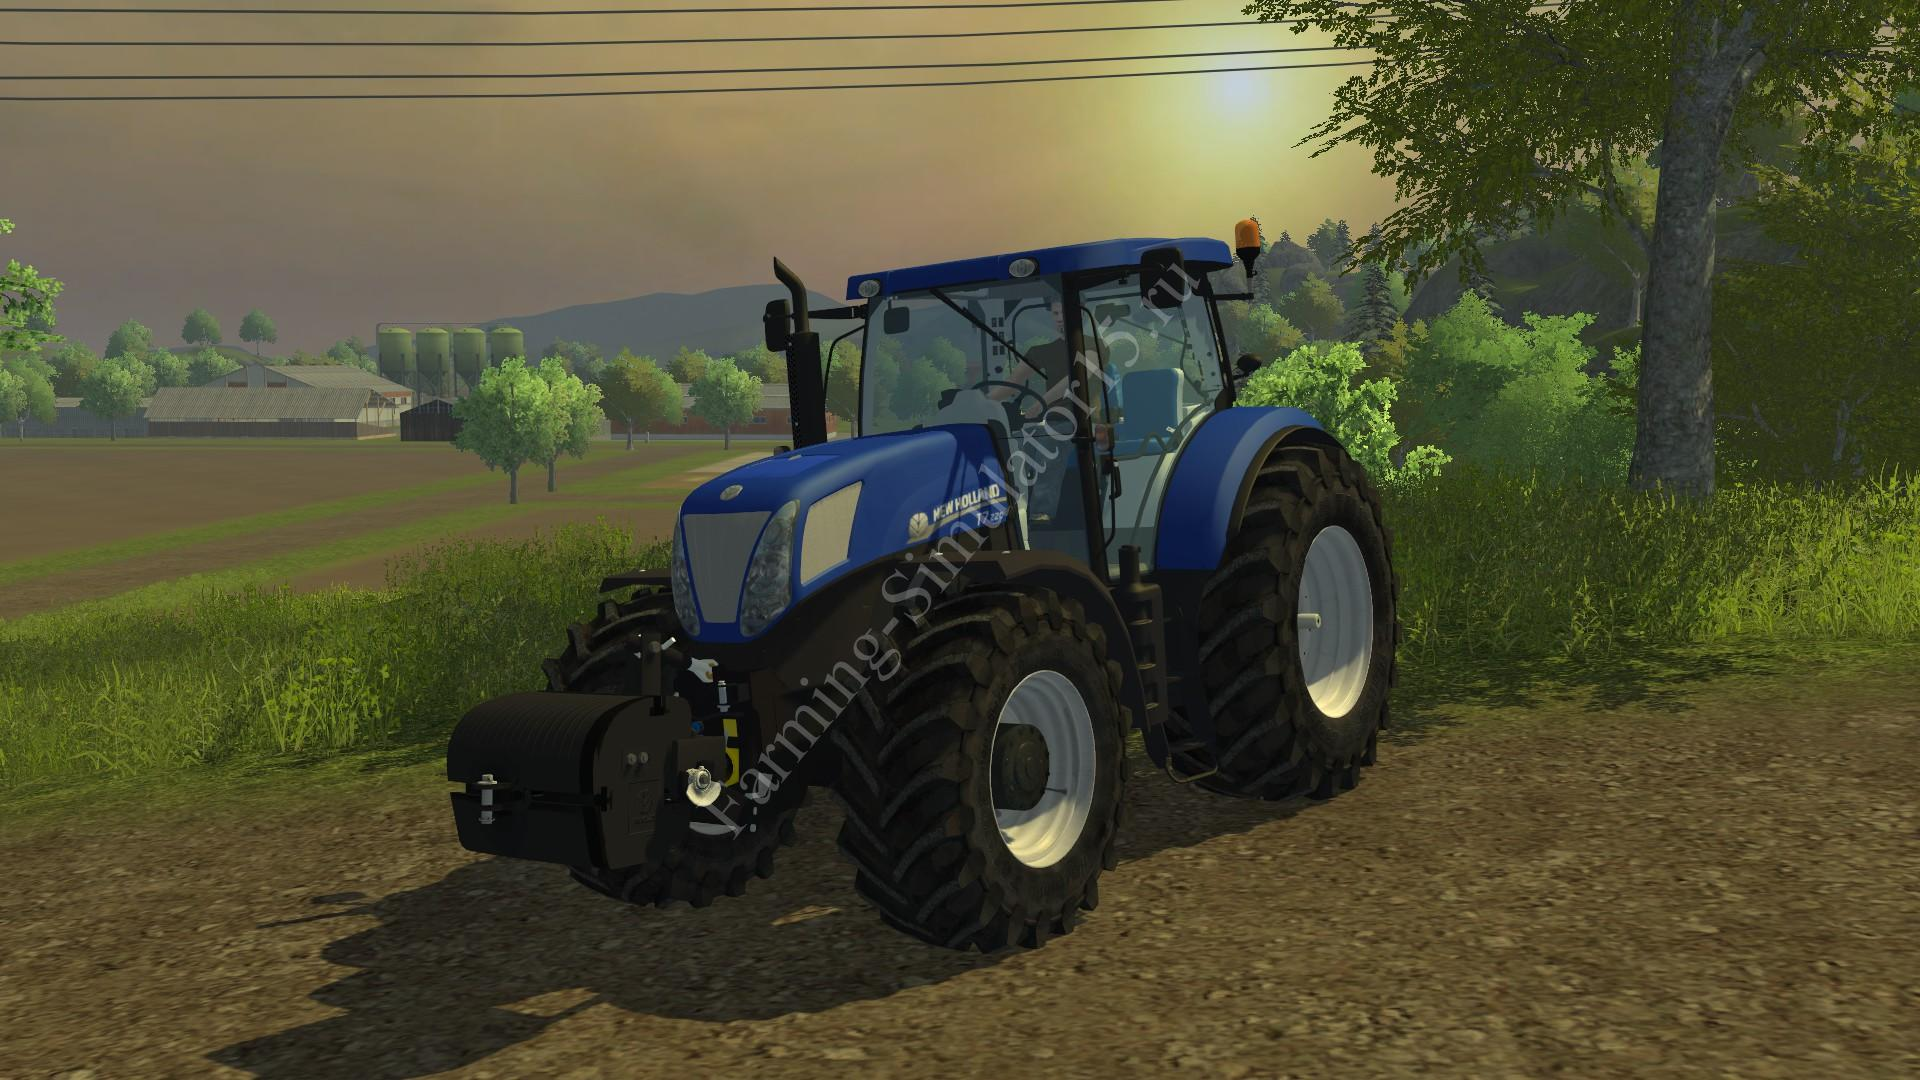 Мод трактора New Holland T7 220 Blue Power v 1.0 Farming Simulator 2013, Farming Simulator 13